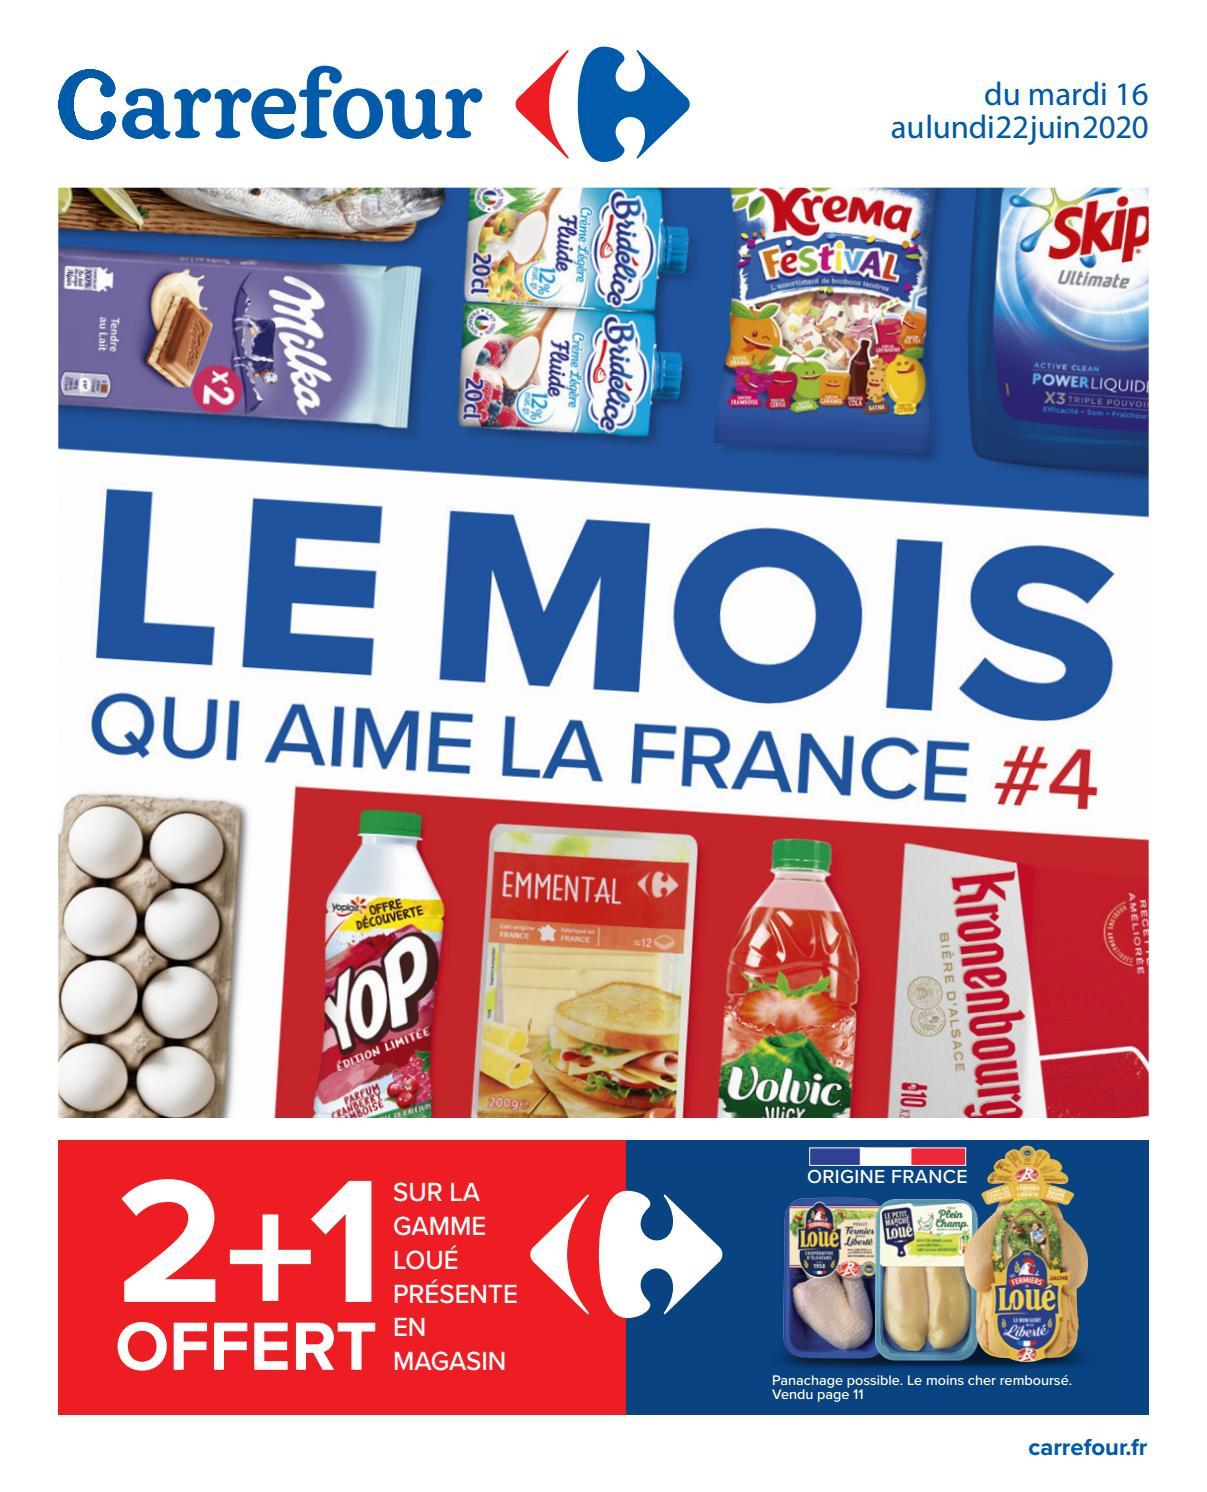 Carrefour France Catalogue Le Mois Aqui Aime La France 4 By Hmbe Catalogue Promotion Issuu